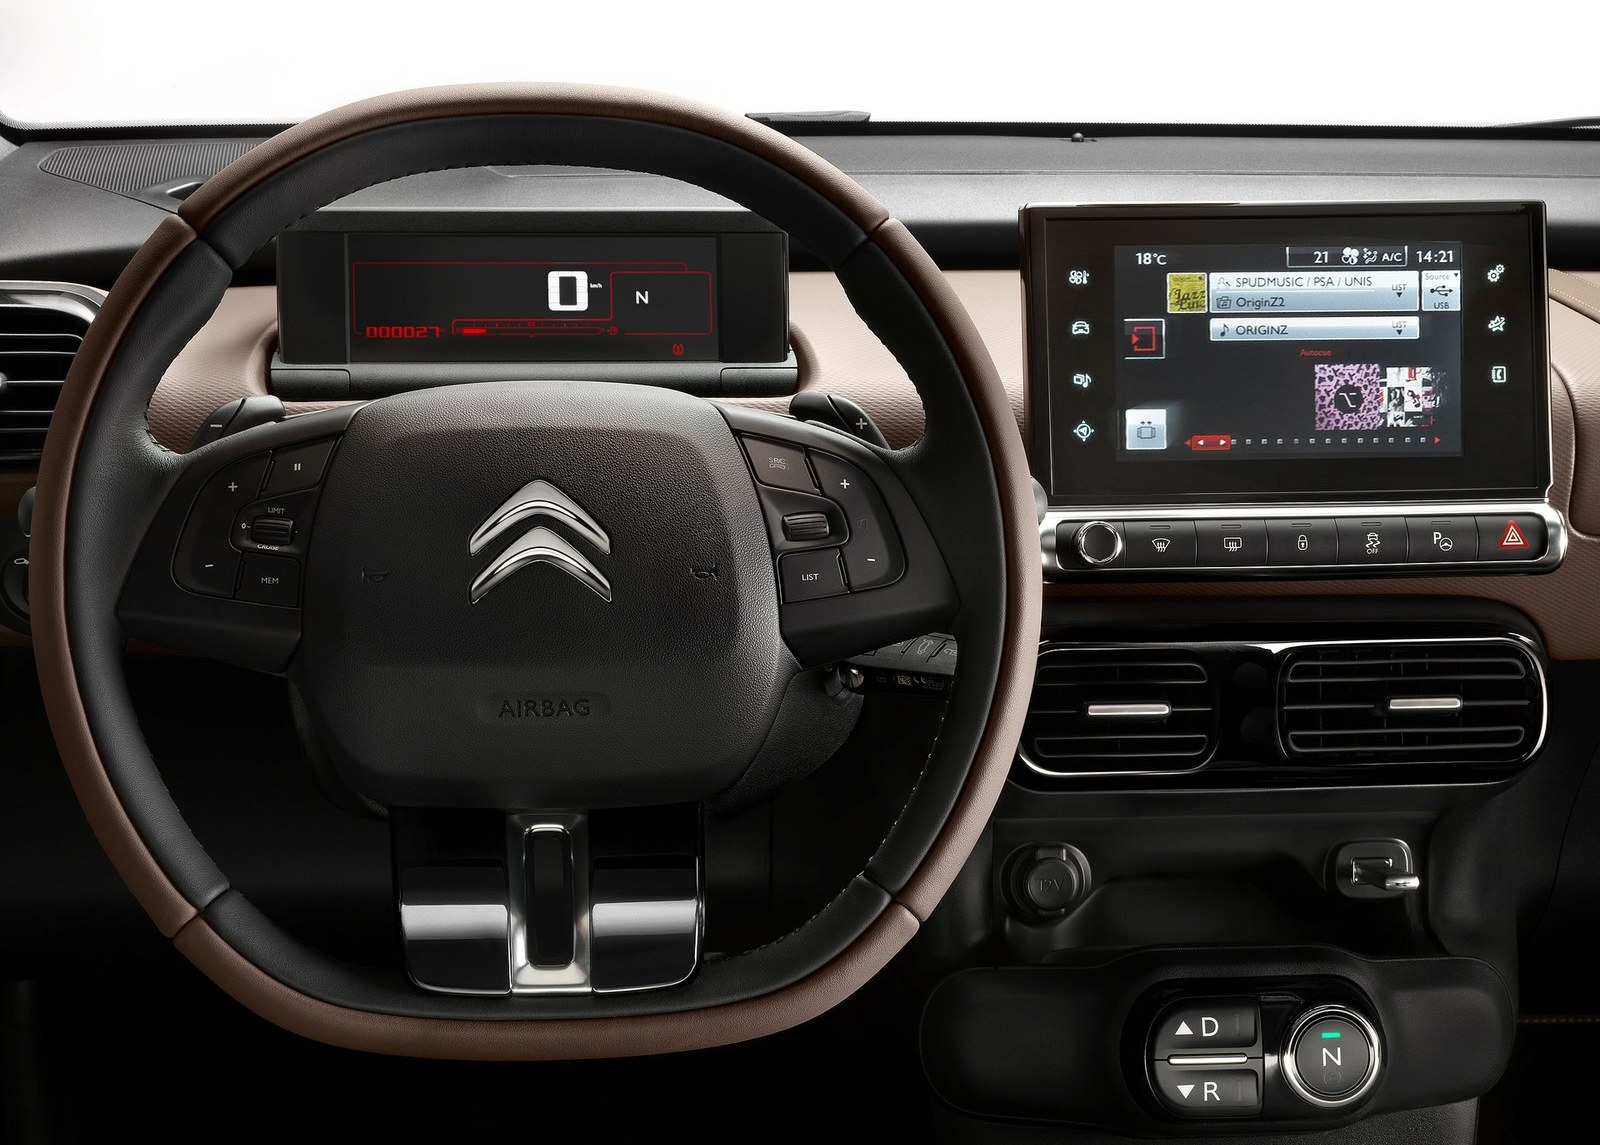 2015 Citroen C4 Cactus Streering and Speedometer